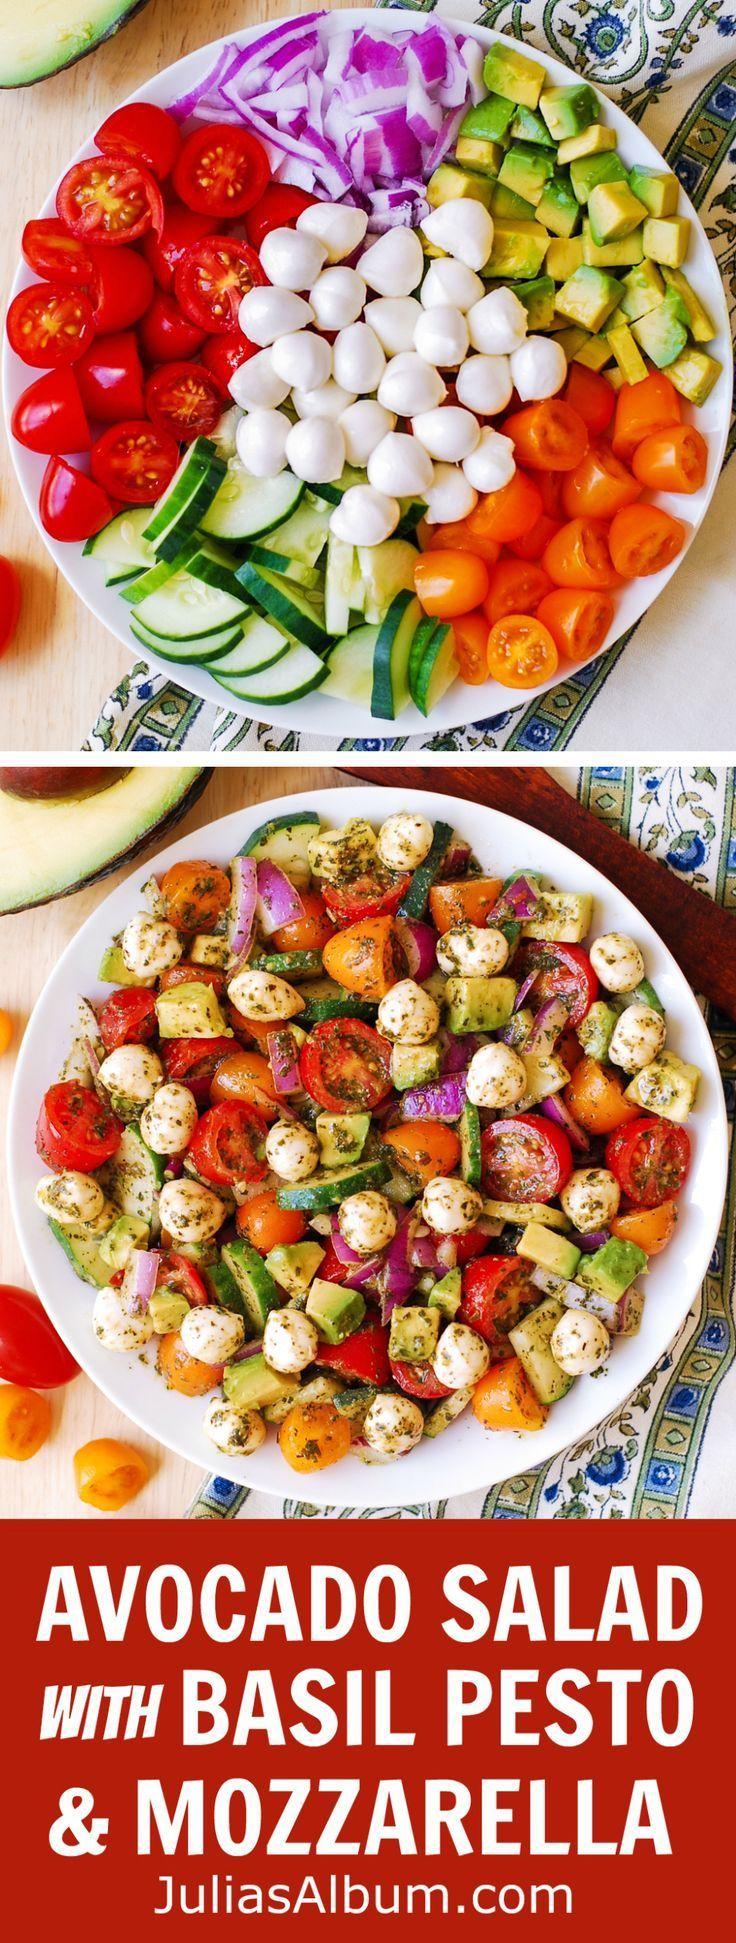 Photo of Avocado salad with mozzarella, basil pesto, tomatoes, cucumber #Mediterranean -…